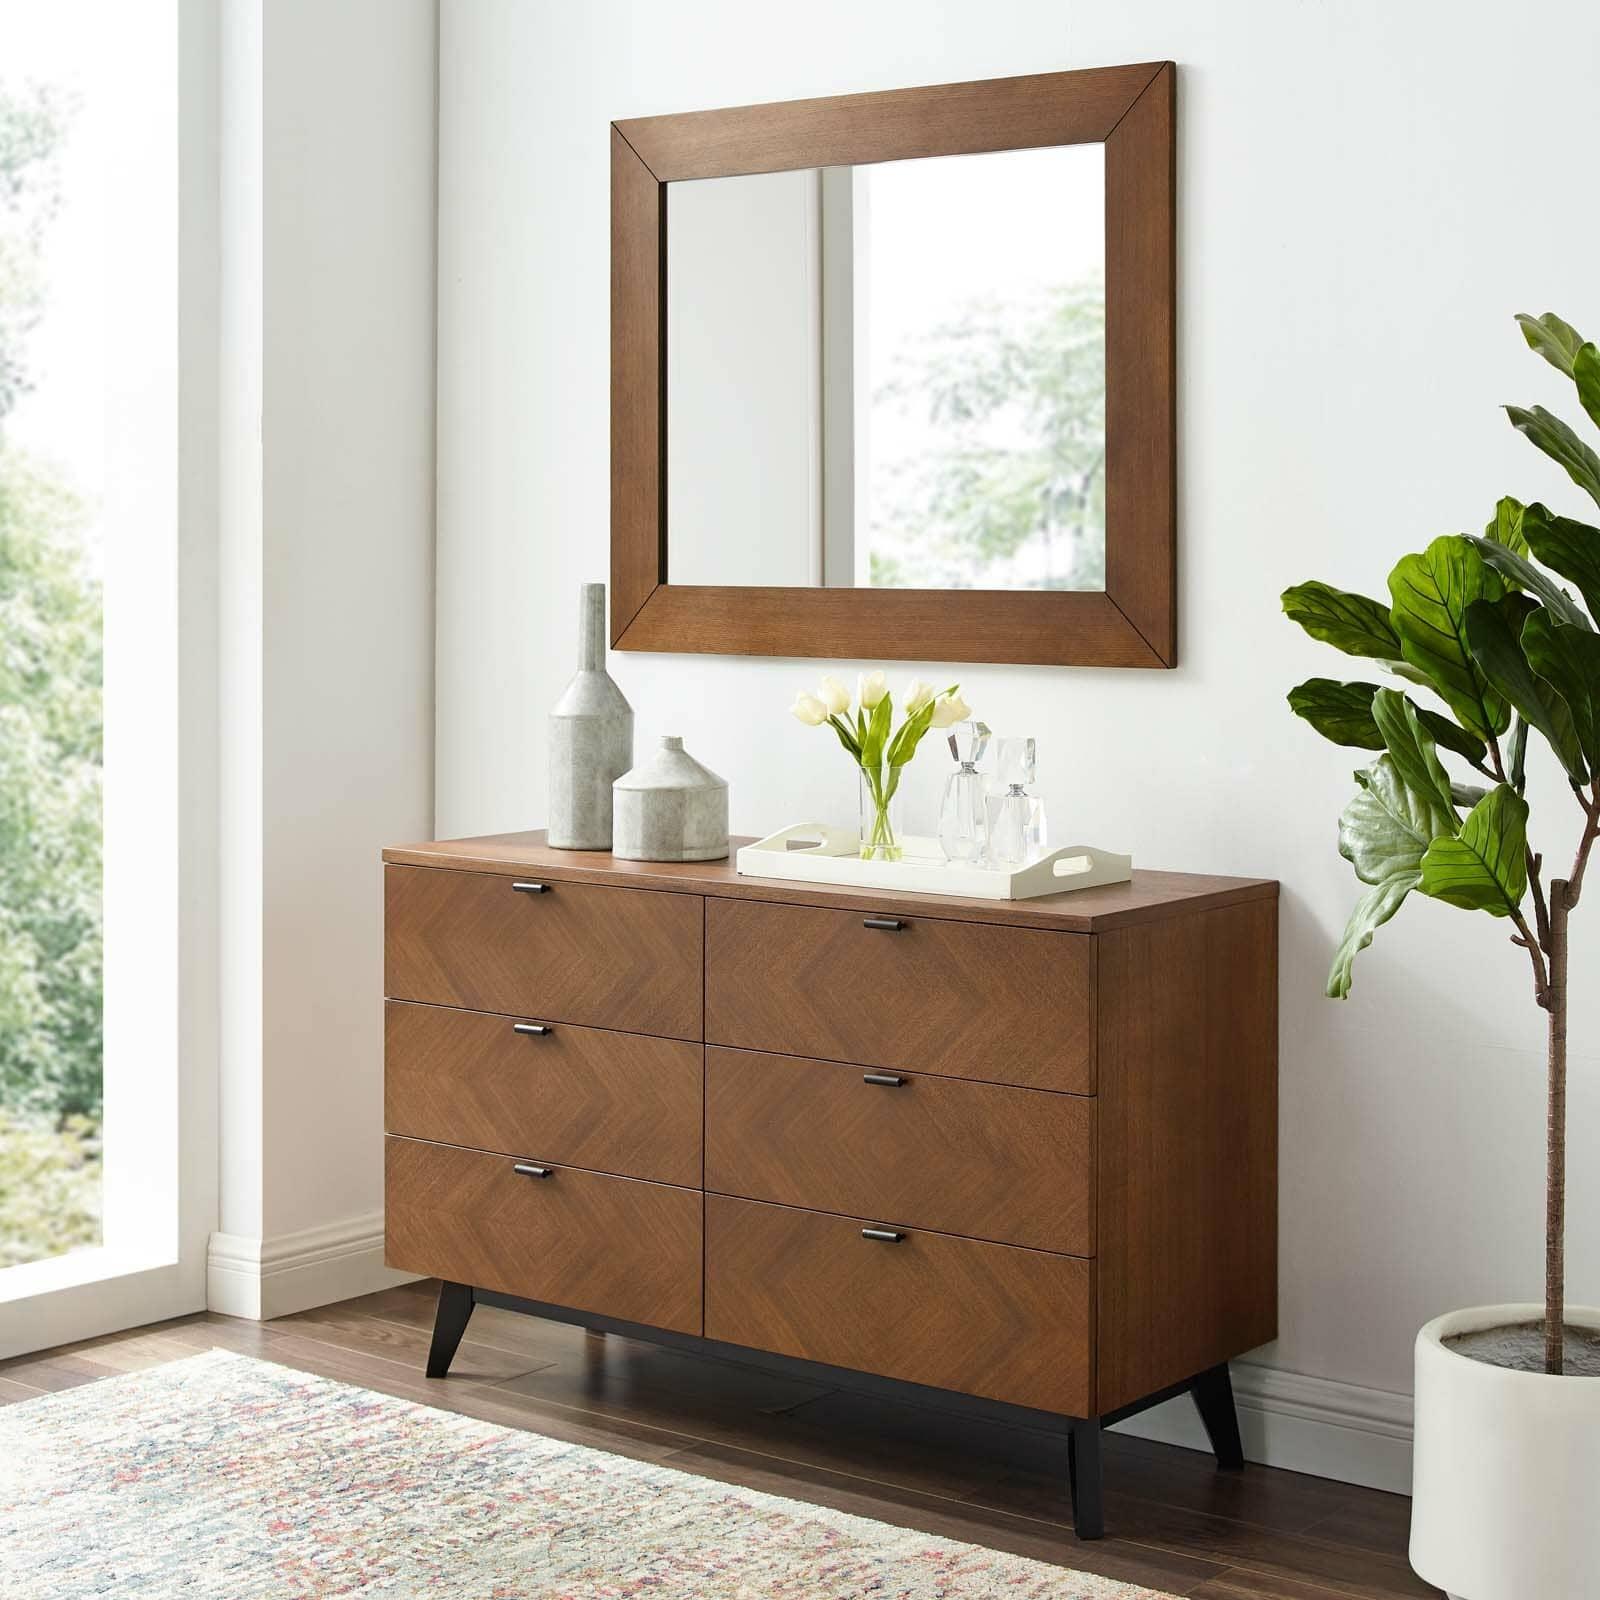 Antonelli 6 Drawer Double Dresser with Mirror